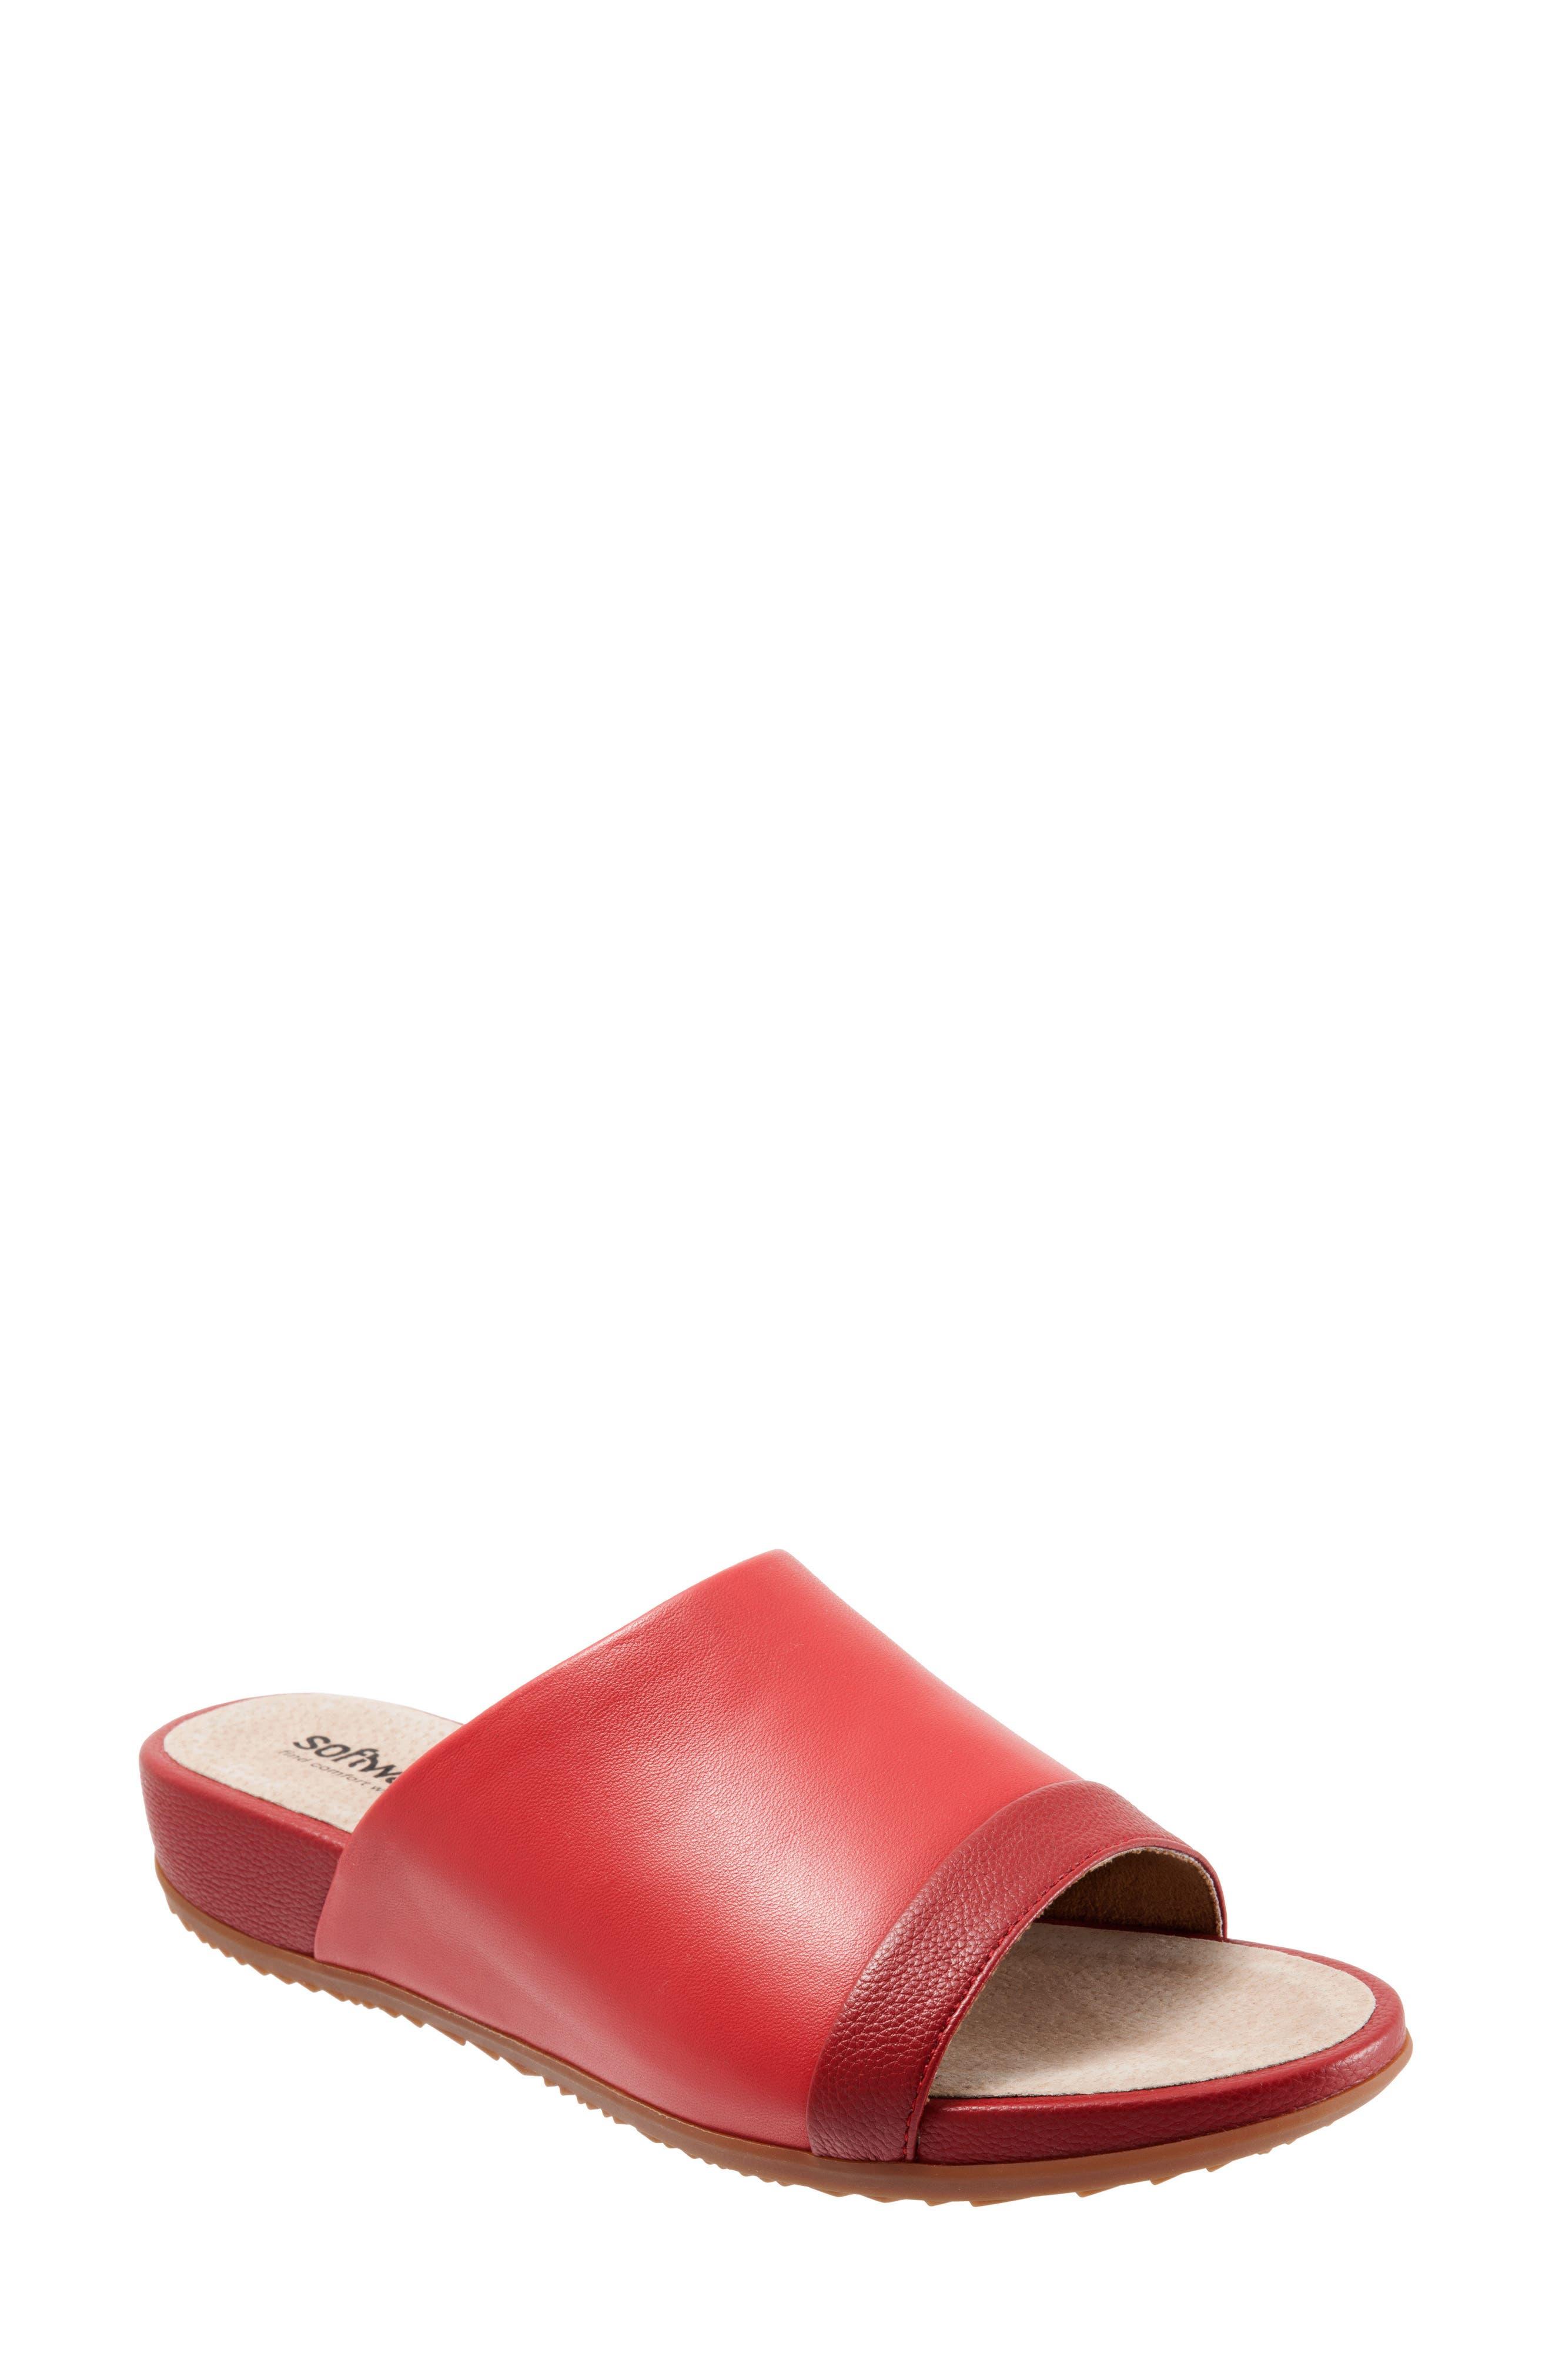 SOFTWALK<SUP>®</SUP>, Del Mar Slide Sandal, Main thumbnail 1, color, RED LEATHER